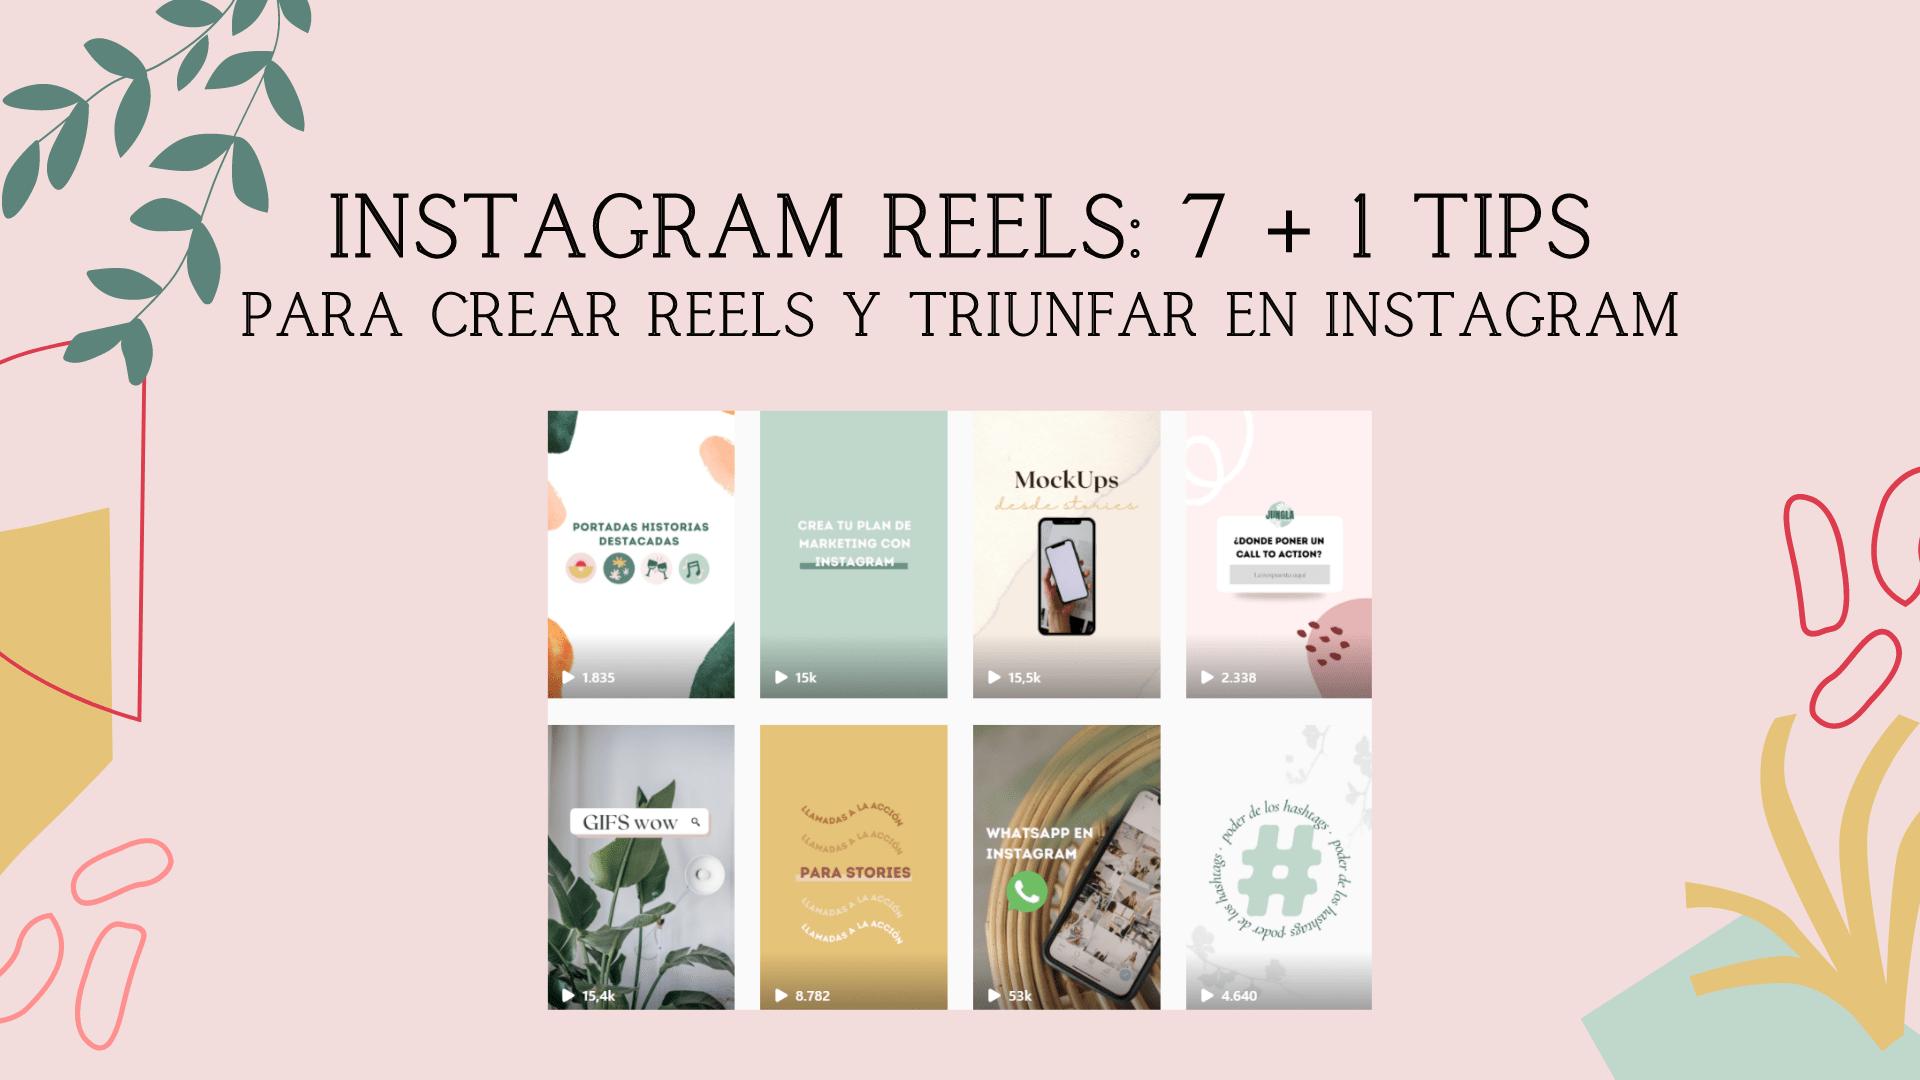 Instagram REELS: 7 + 1 TIPS para crear Reels y triunfar en Instagram